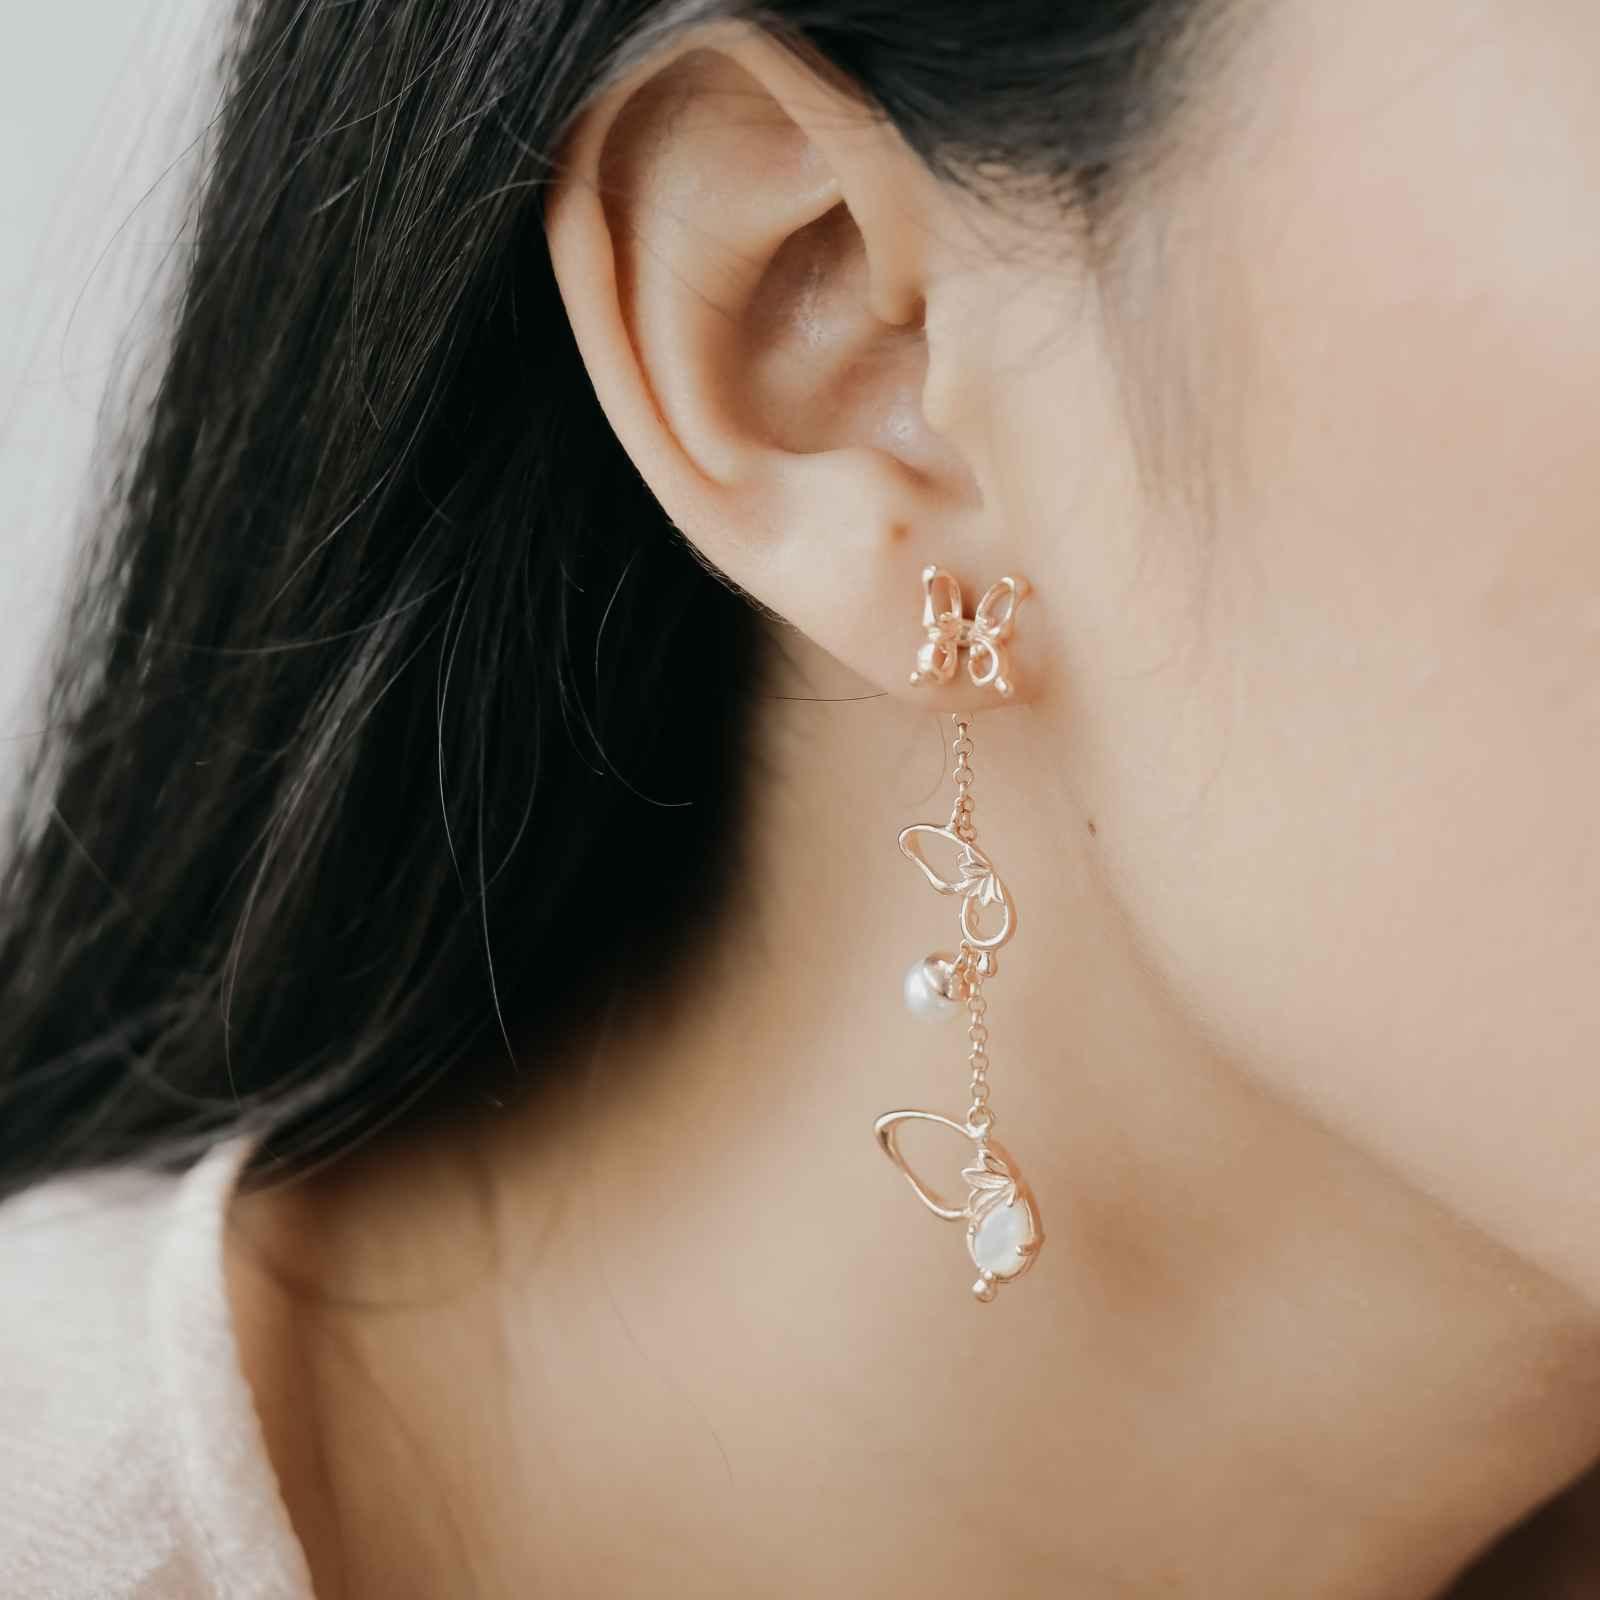 Kupu Two Way Earrings